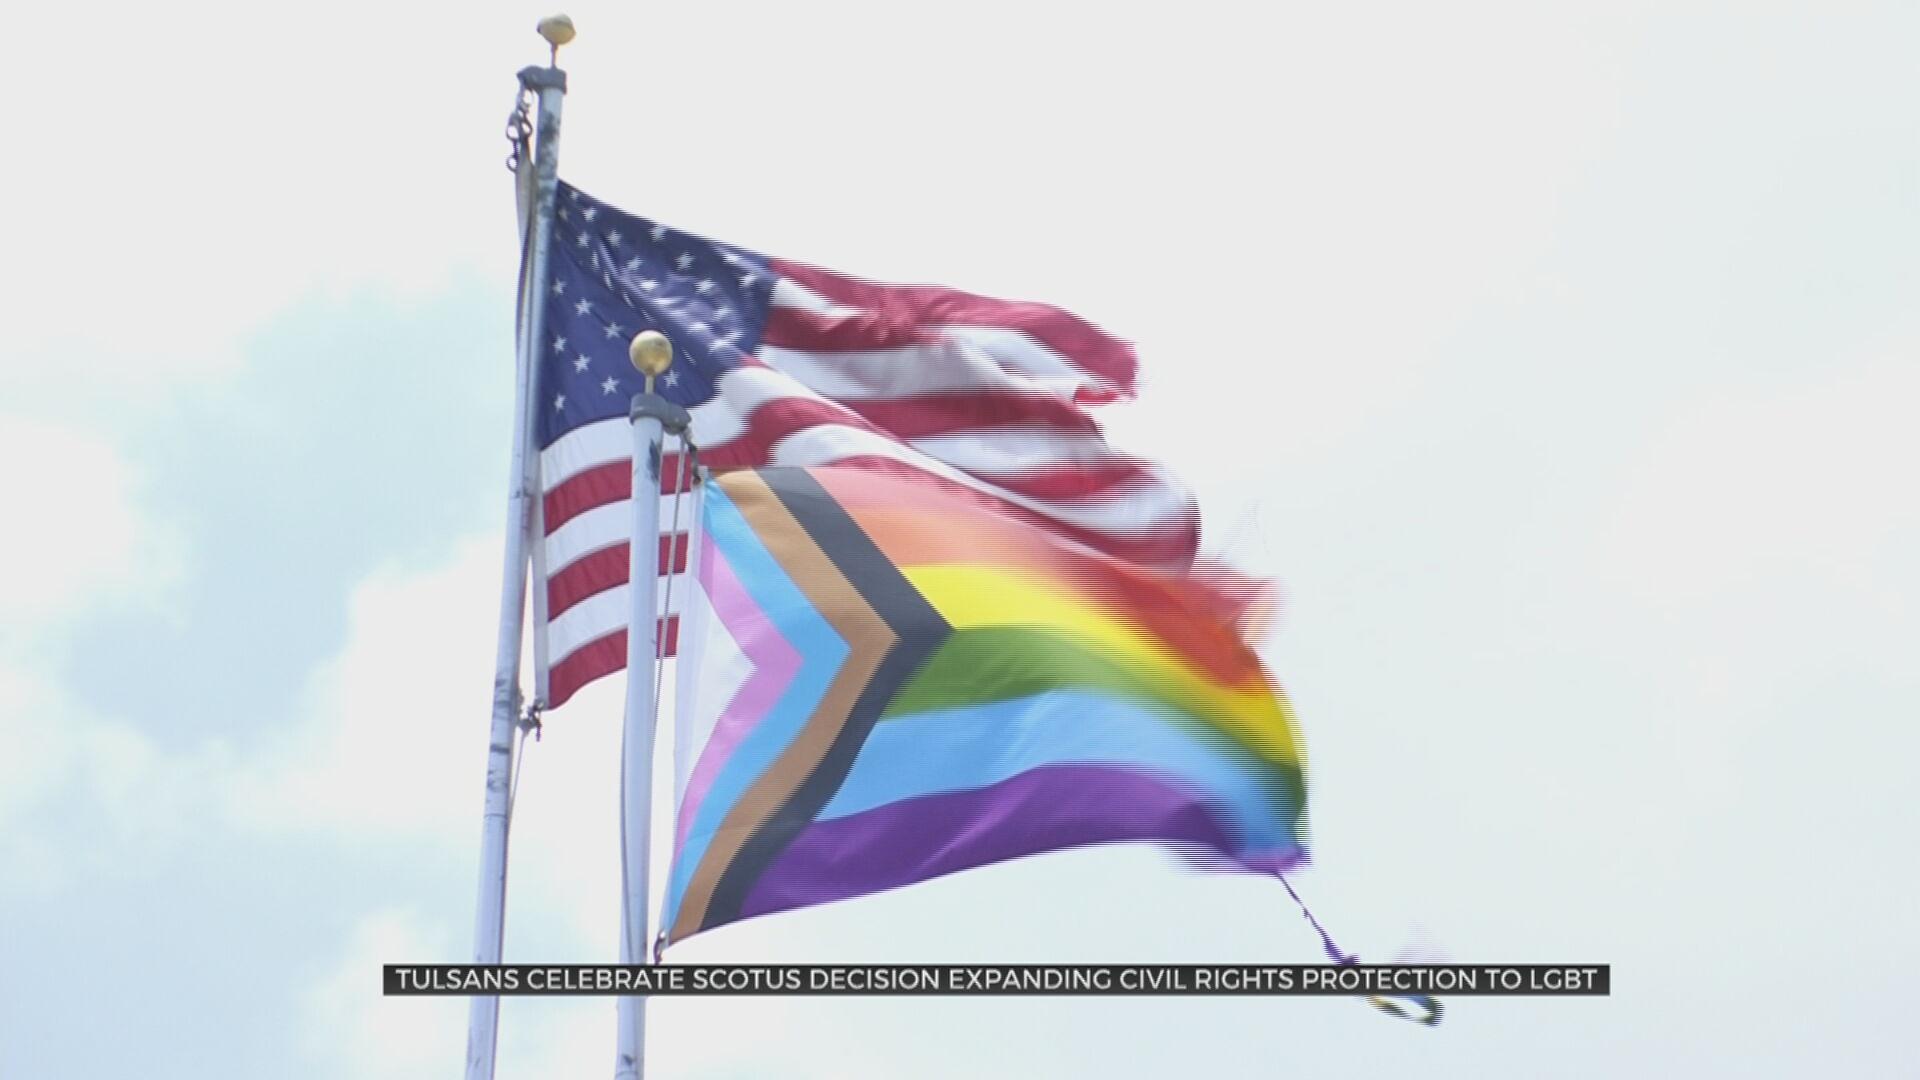 Oklahomans For Equality Board President Praises Supreme Court's Decision